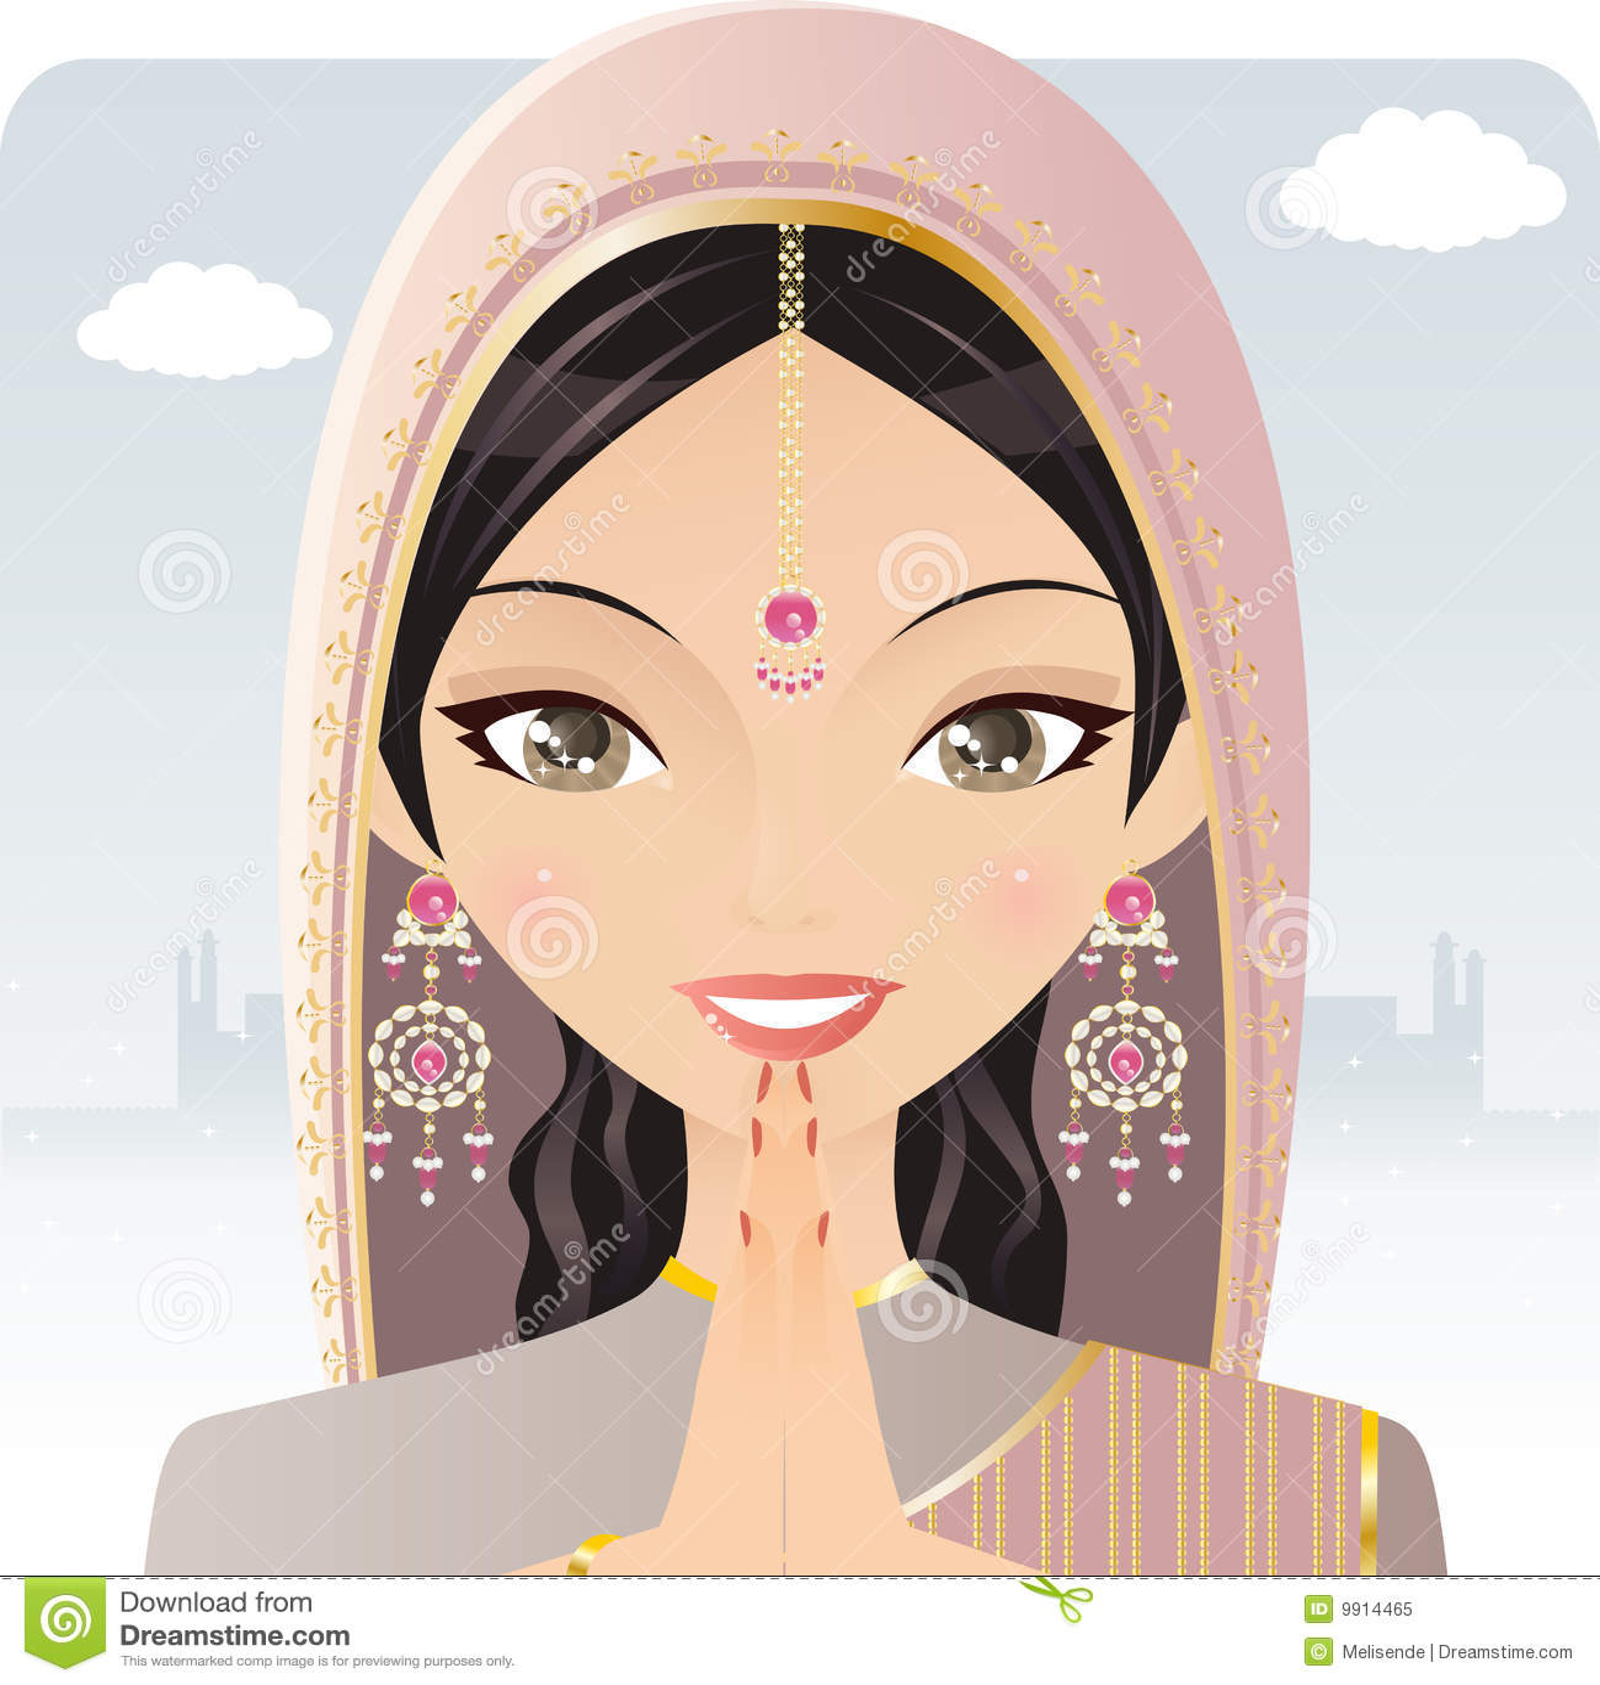 coin hindu single women India women dating, india single women online deepika sharma hindu bramhin dresses like jeans suits saree all cloths travelling eating cooking etc.